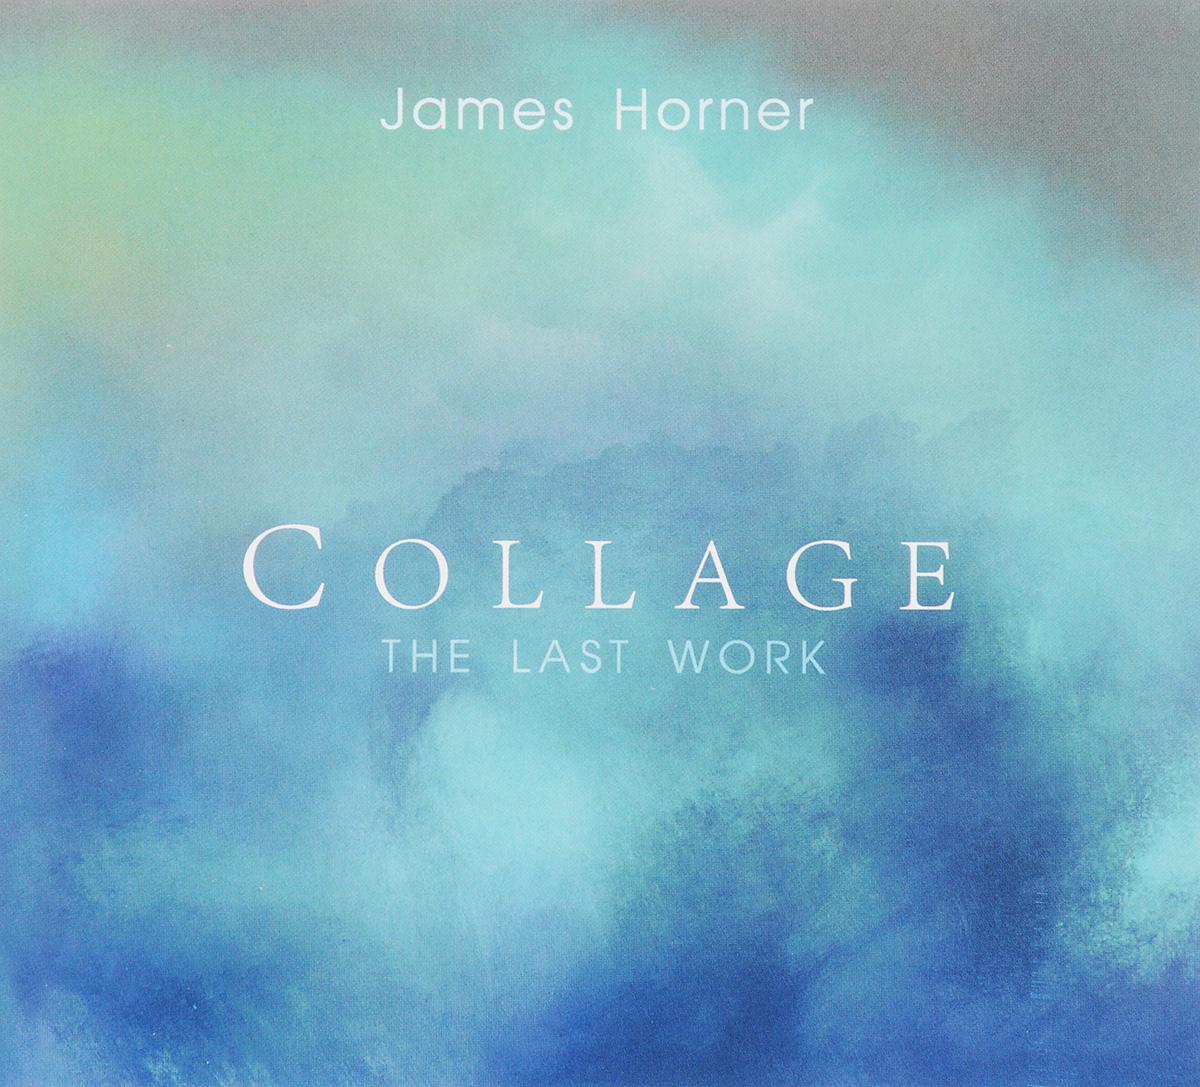 London Philharmonic Orchestra,Jaime Martin,Royal Liverpool Philharmonic Orchestra,Дэвид Арнольд James Horner. Collage The Last Work цена и фото